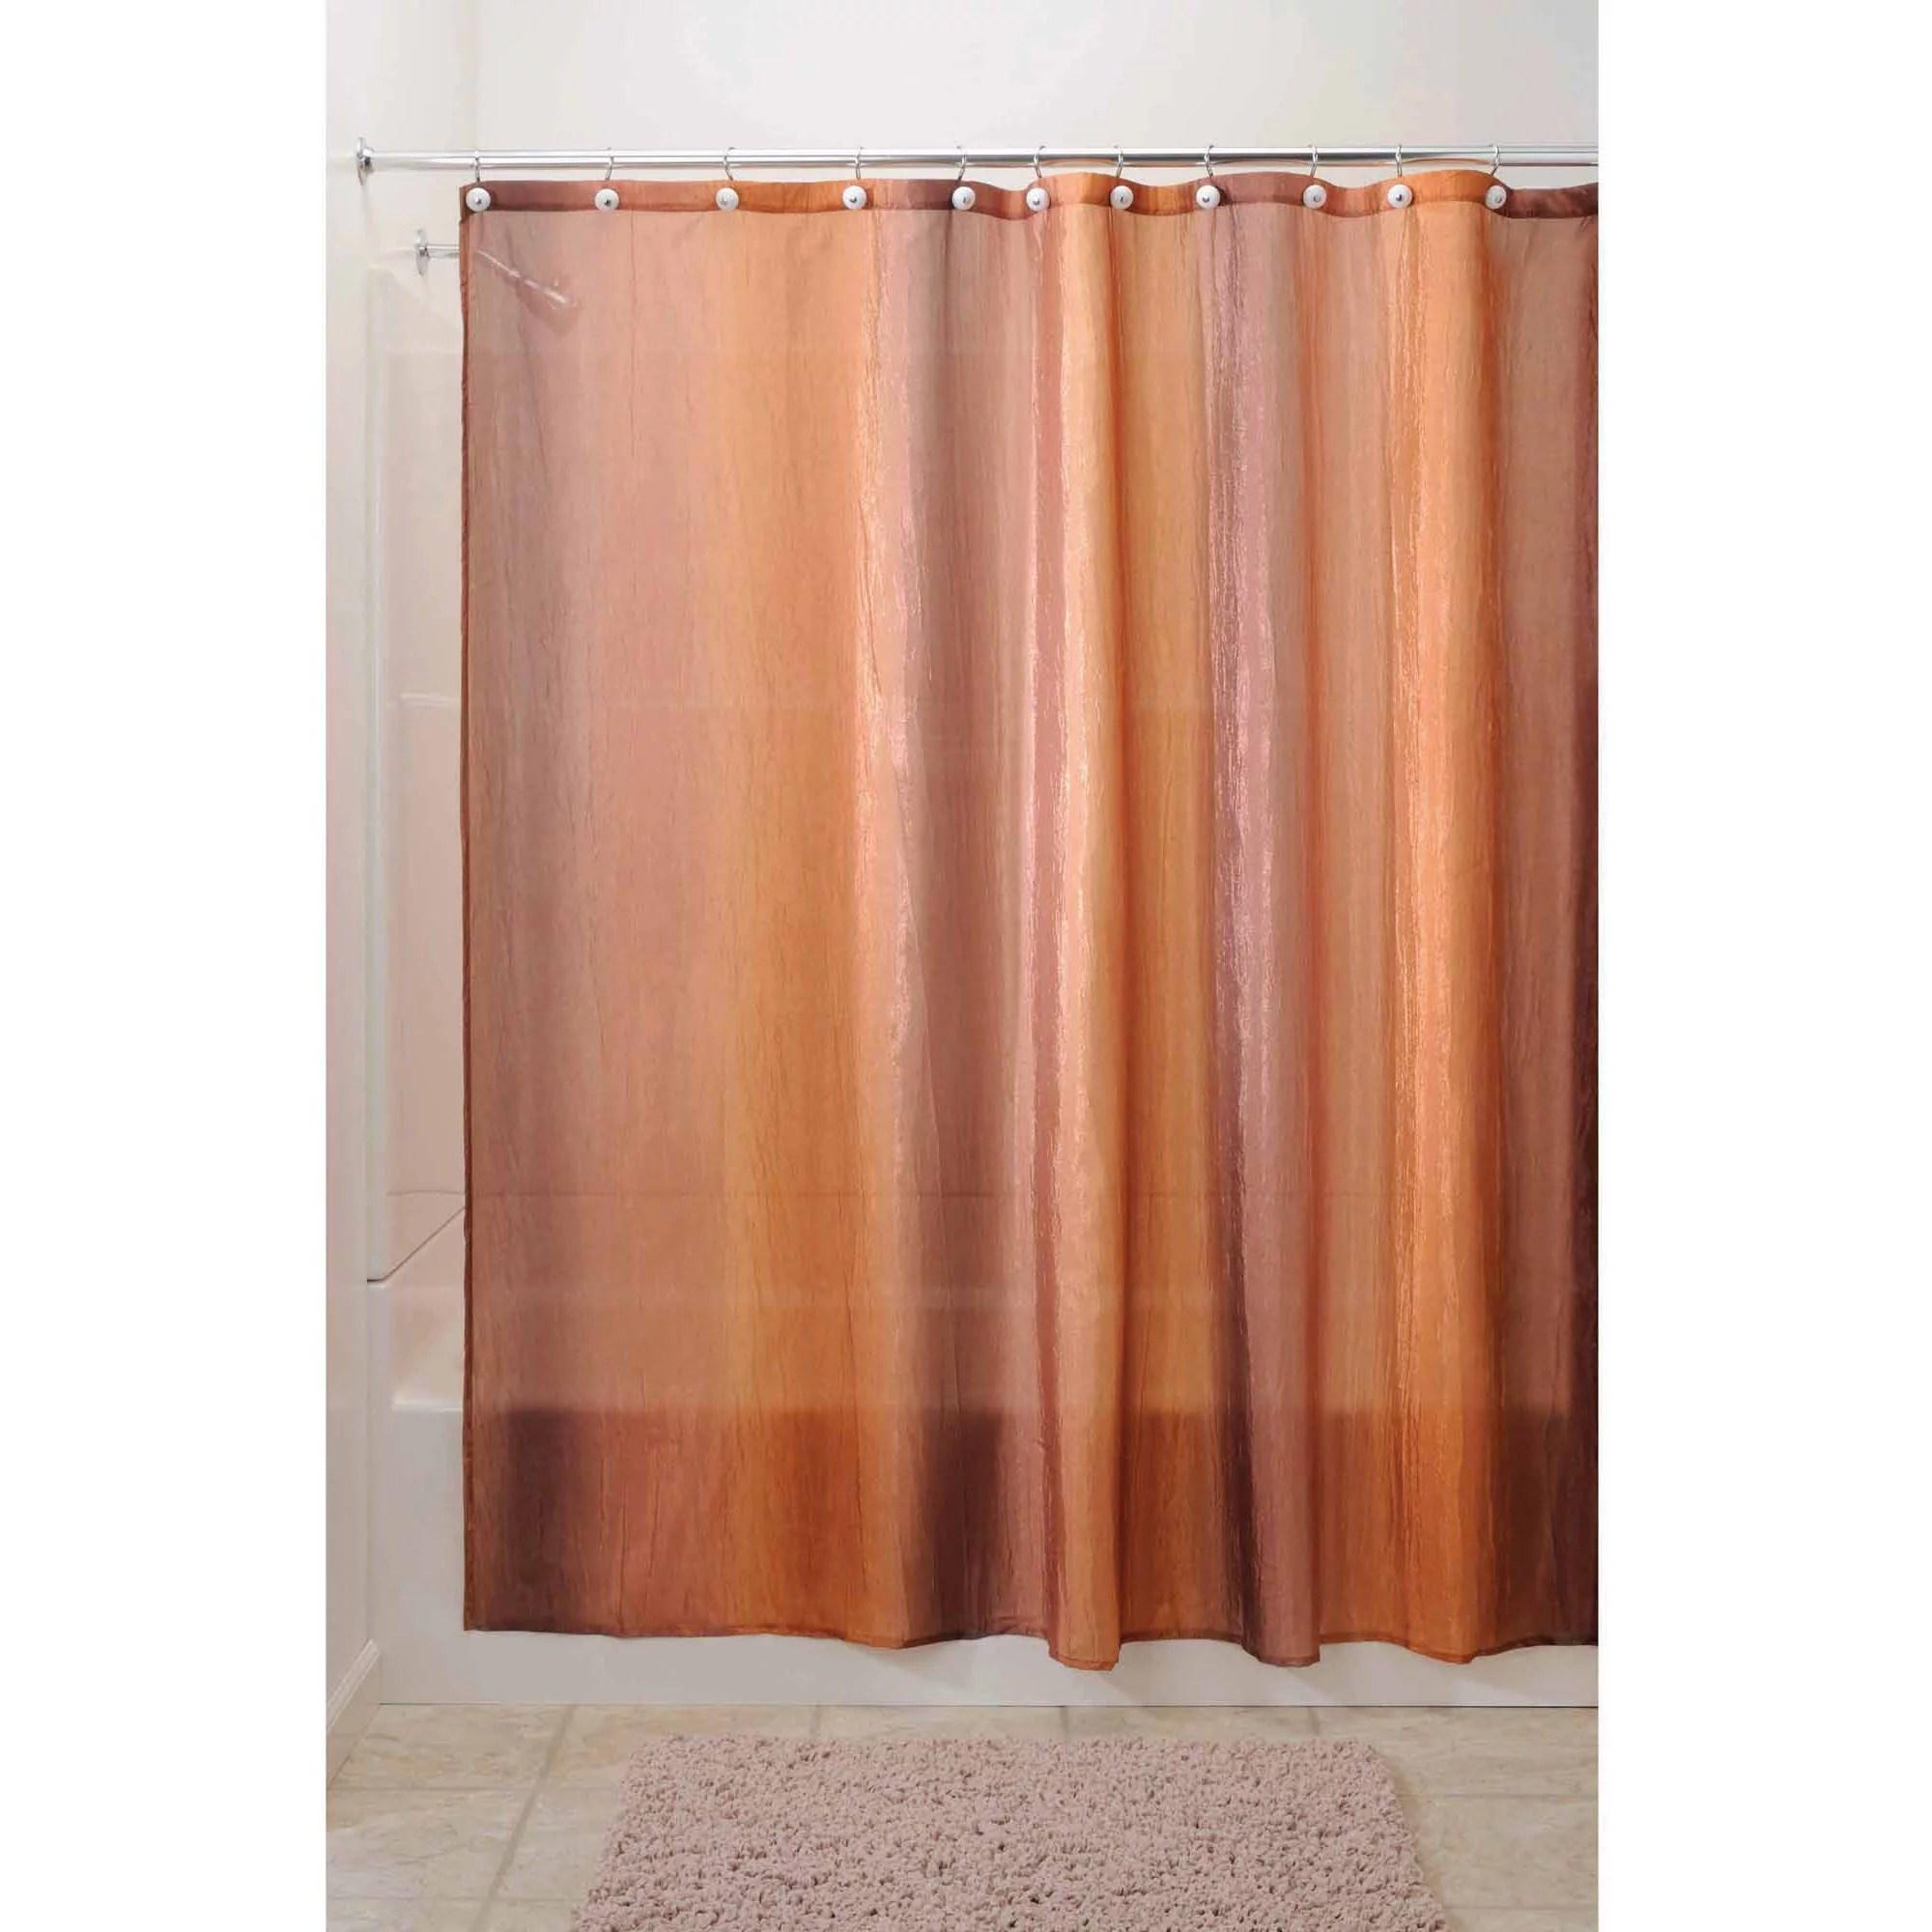 interdesign ombre fabric shower curtain standard 72 x 72 brown gold